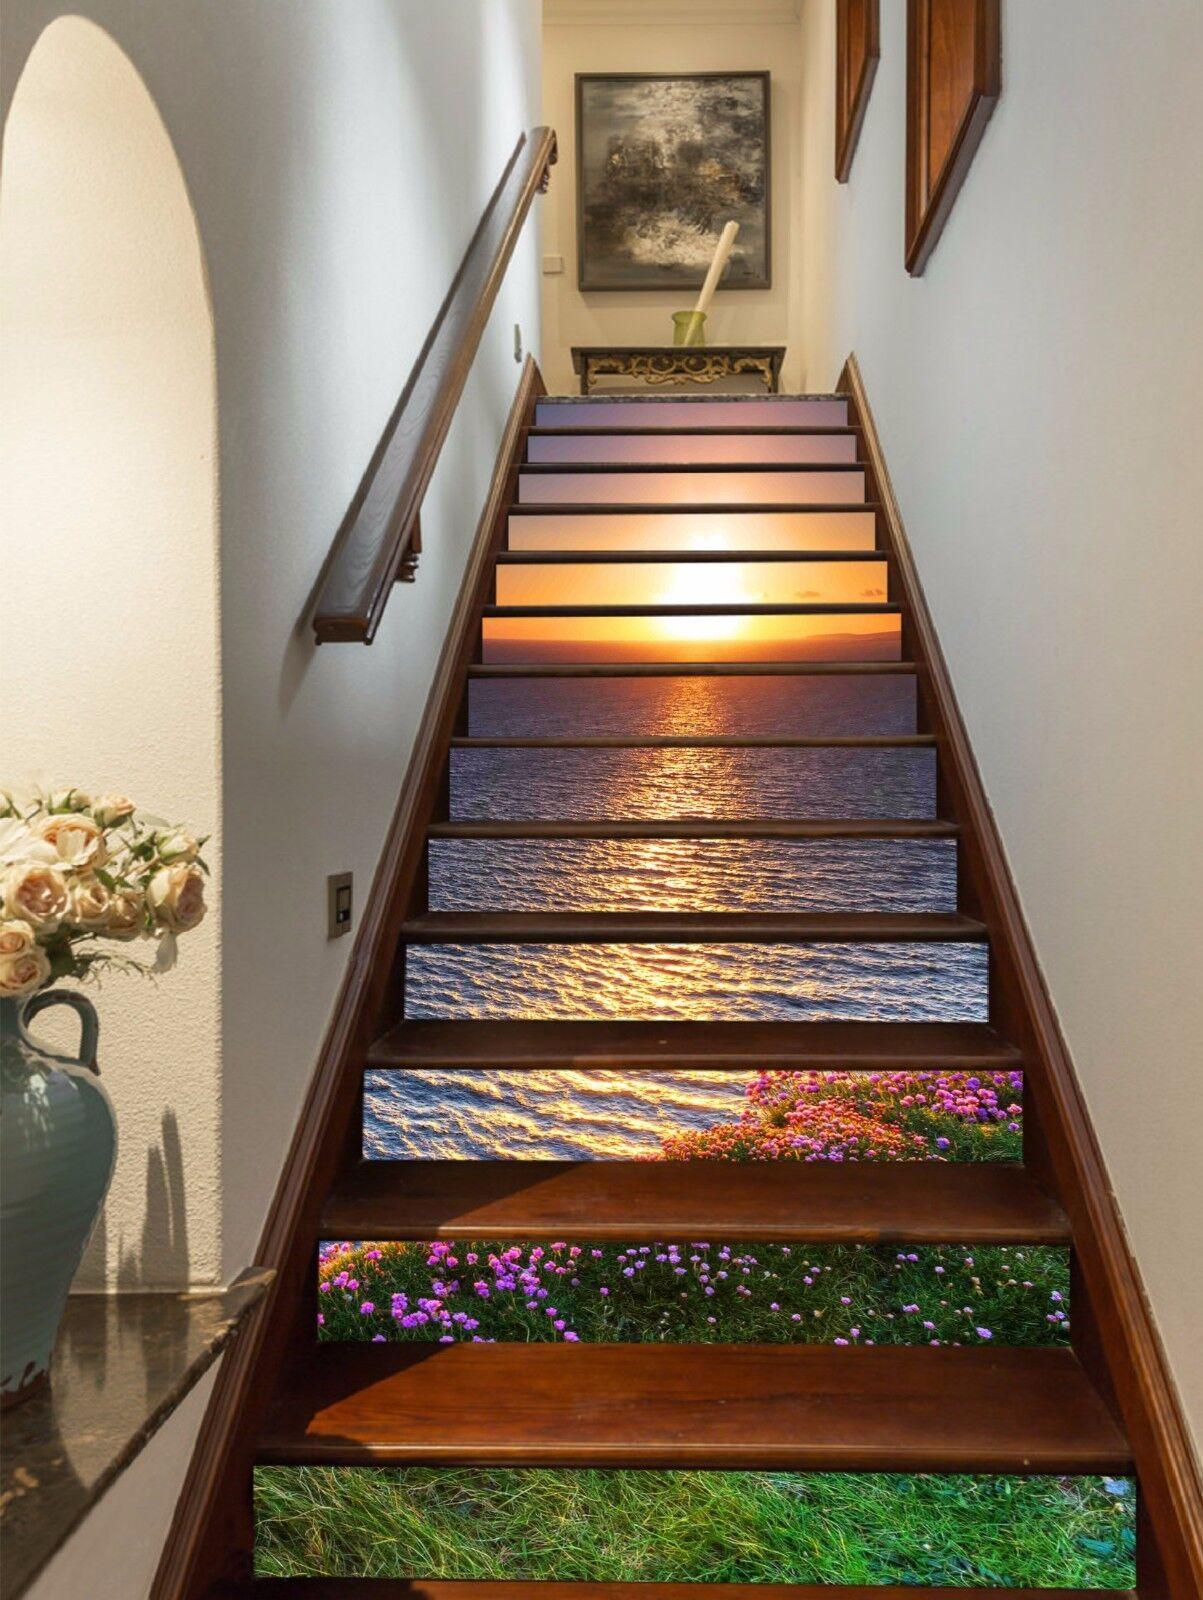 3D Shiny Sea 227 Stair Risers Decoration Photo Mural Vinyl Decal WandPapier AU